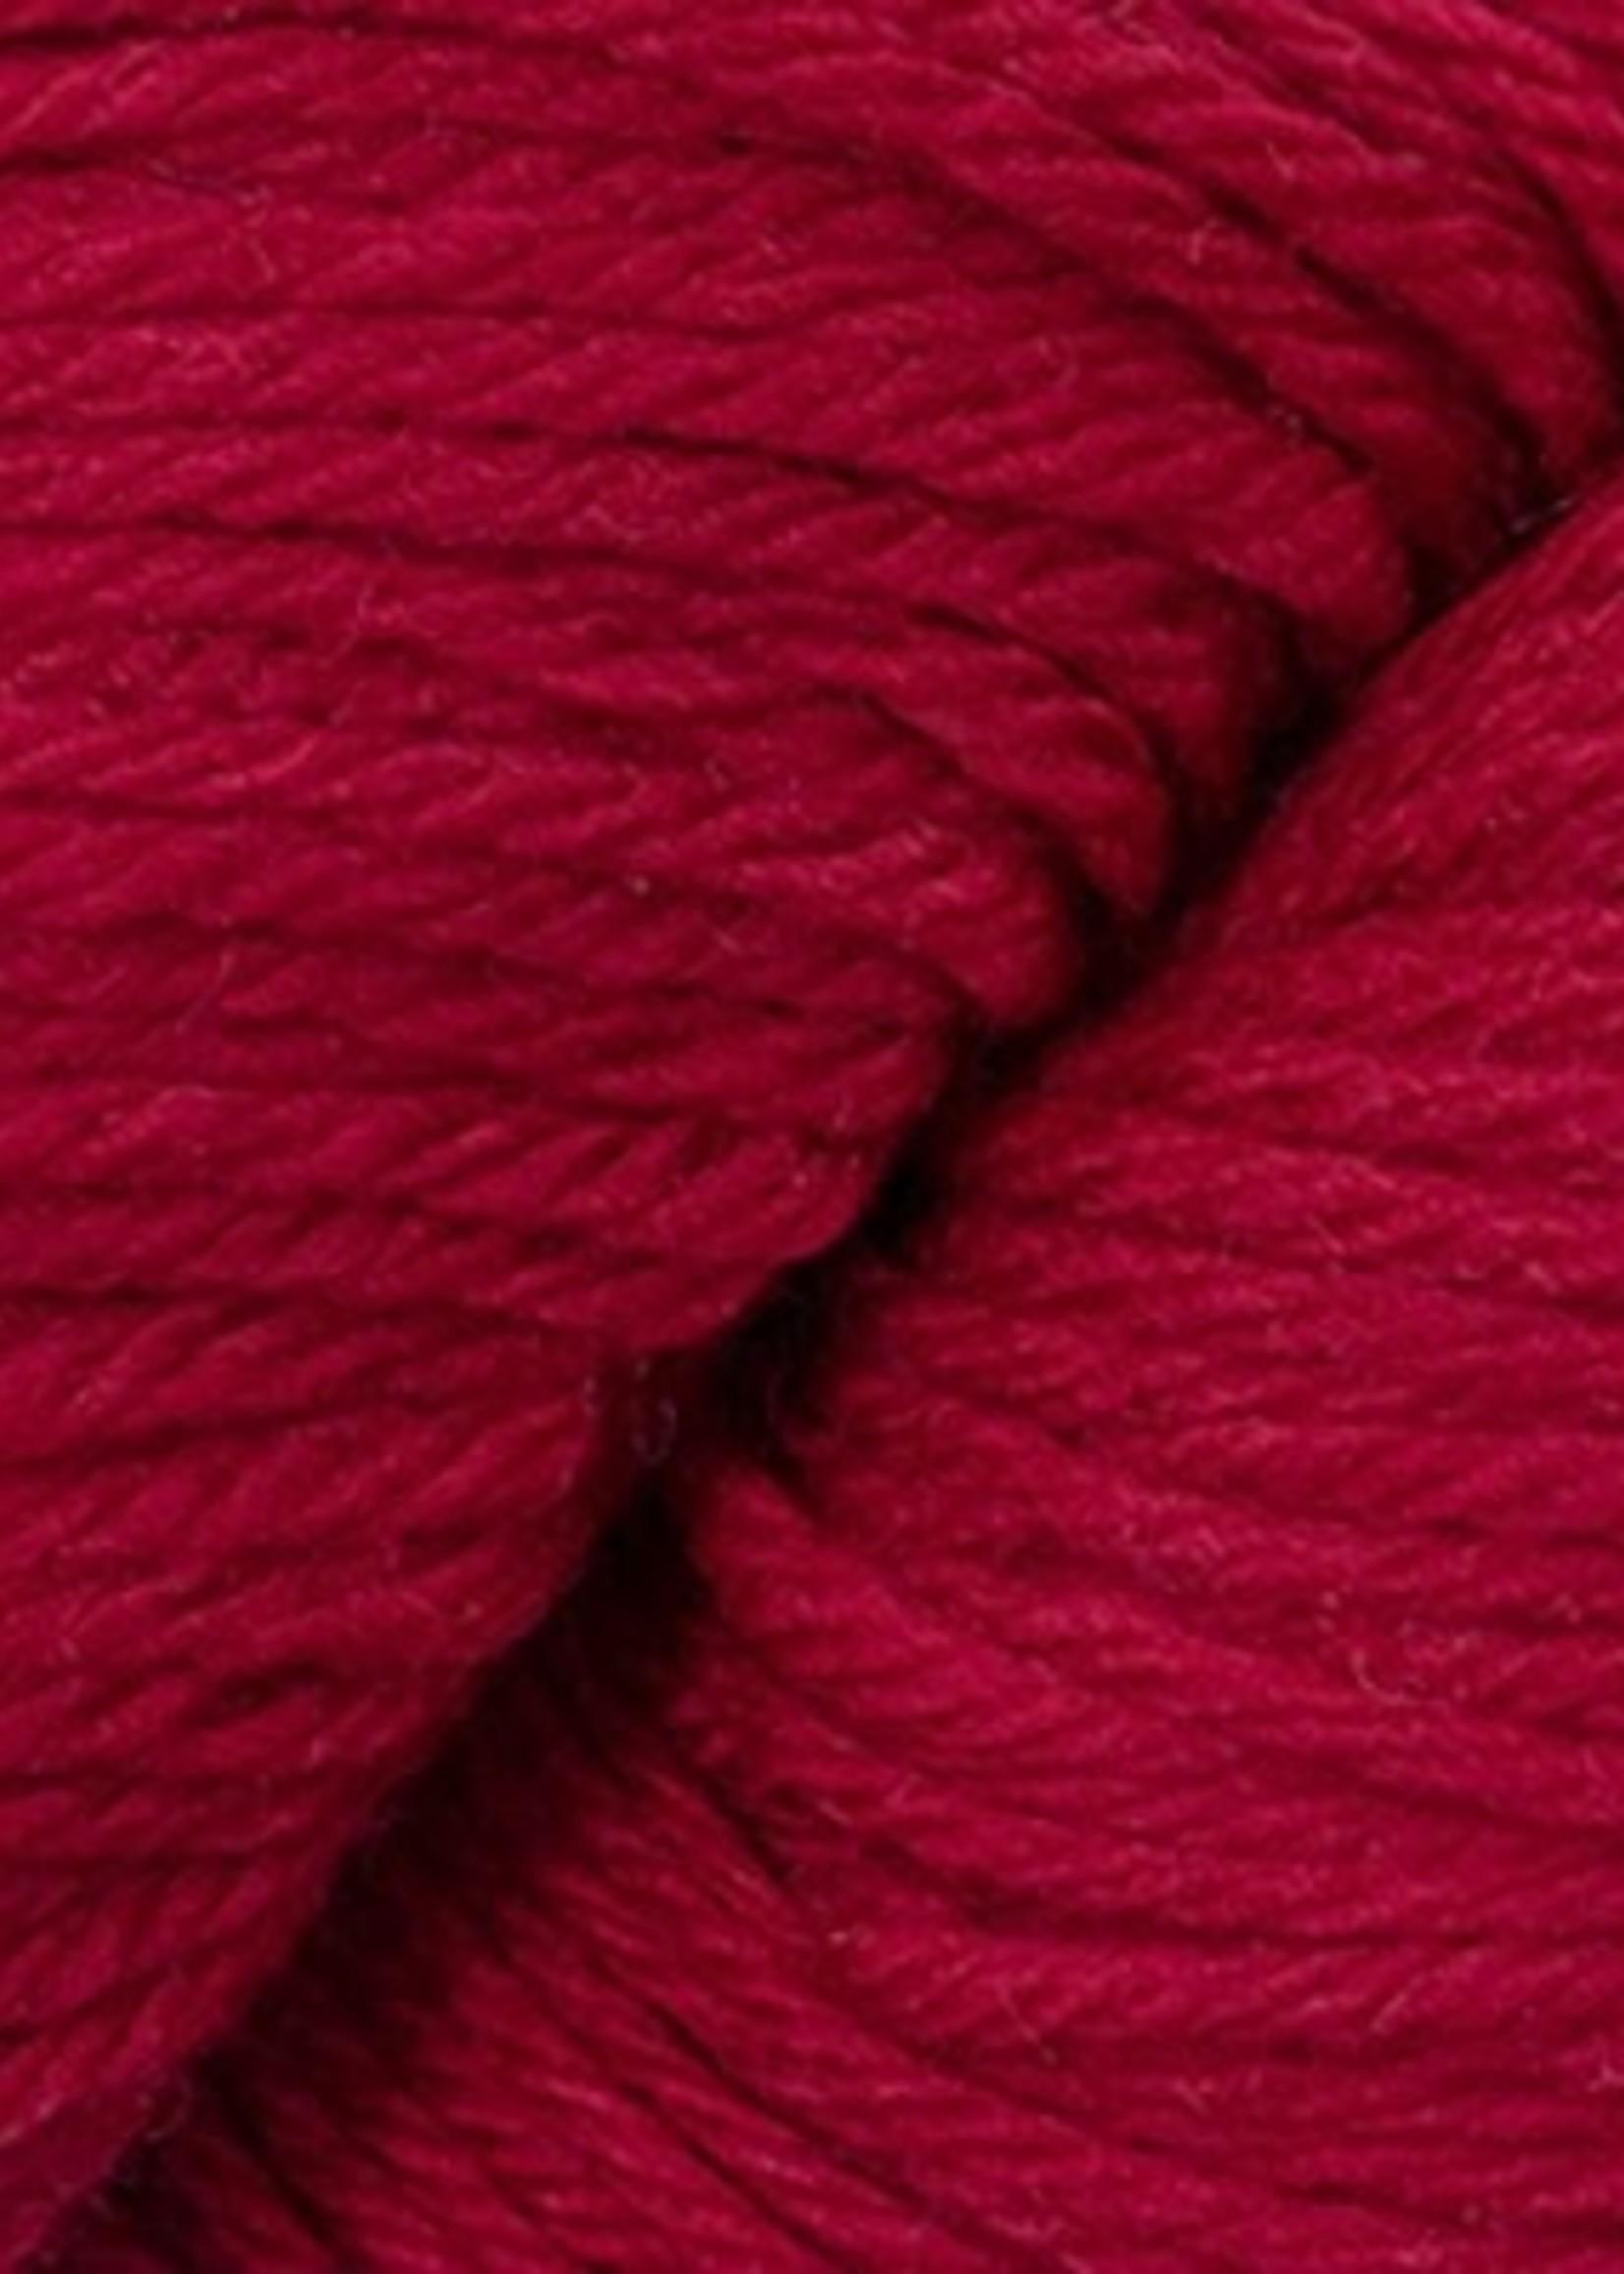 Cascade Cascade 220 Yarn #8895 Christmas Red